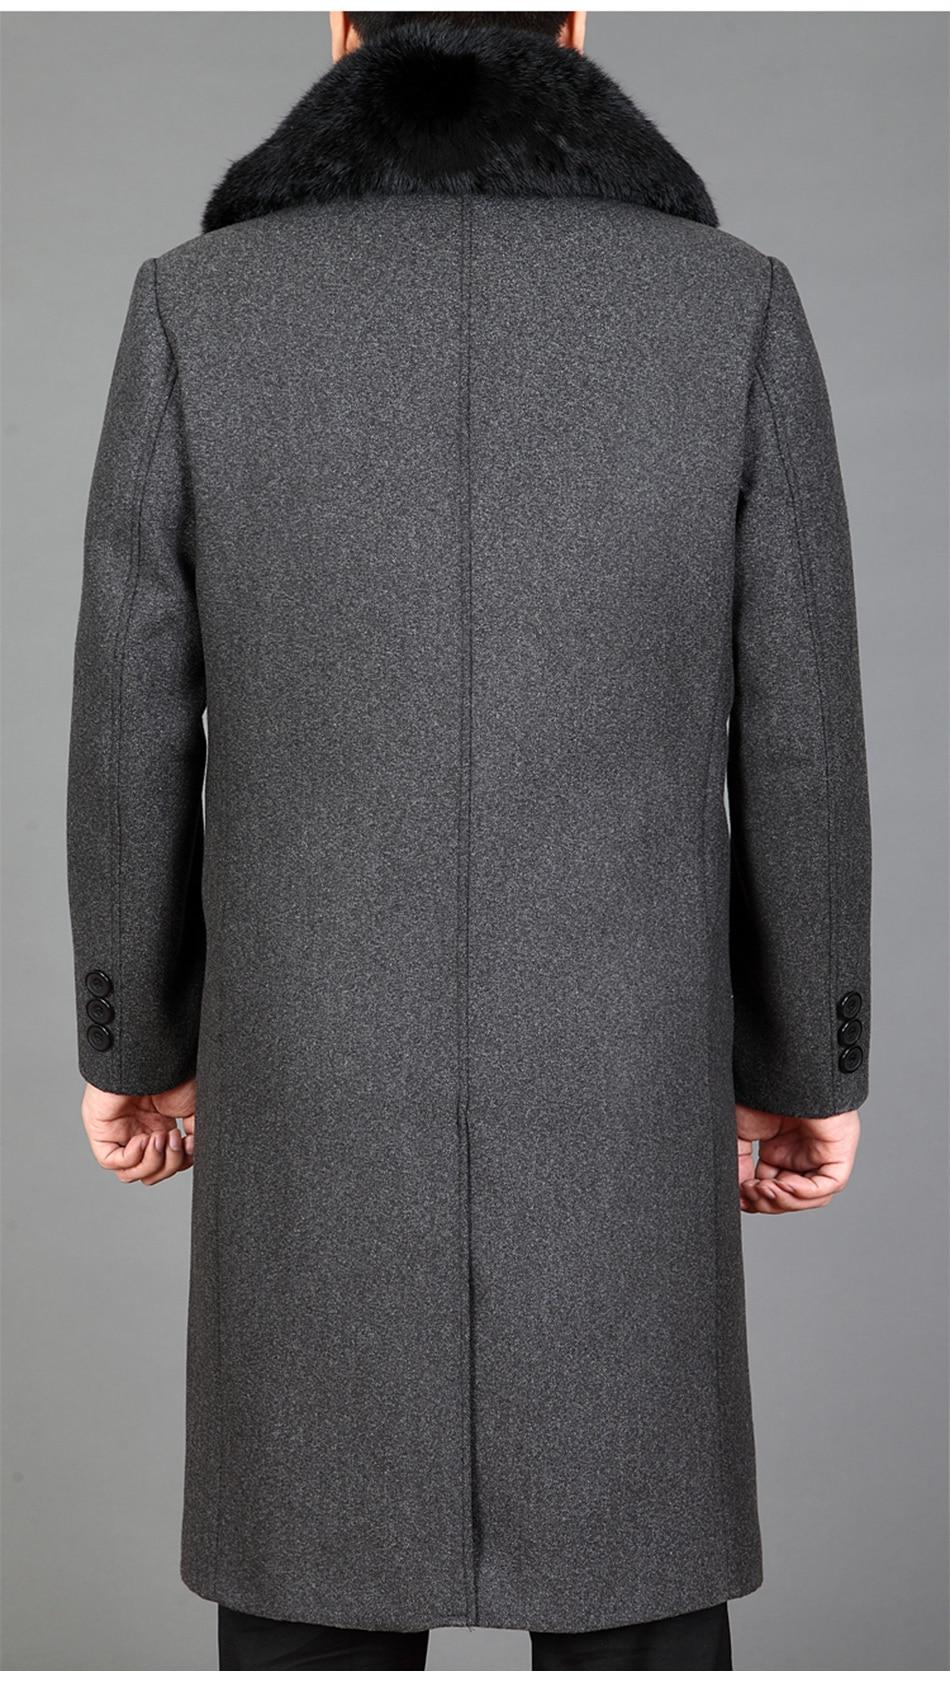 wool overcoat (7)